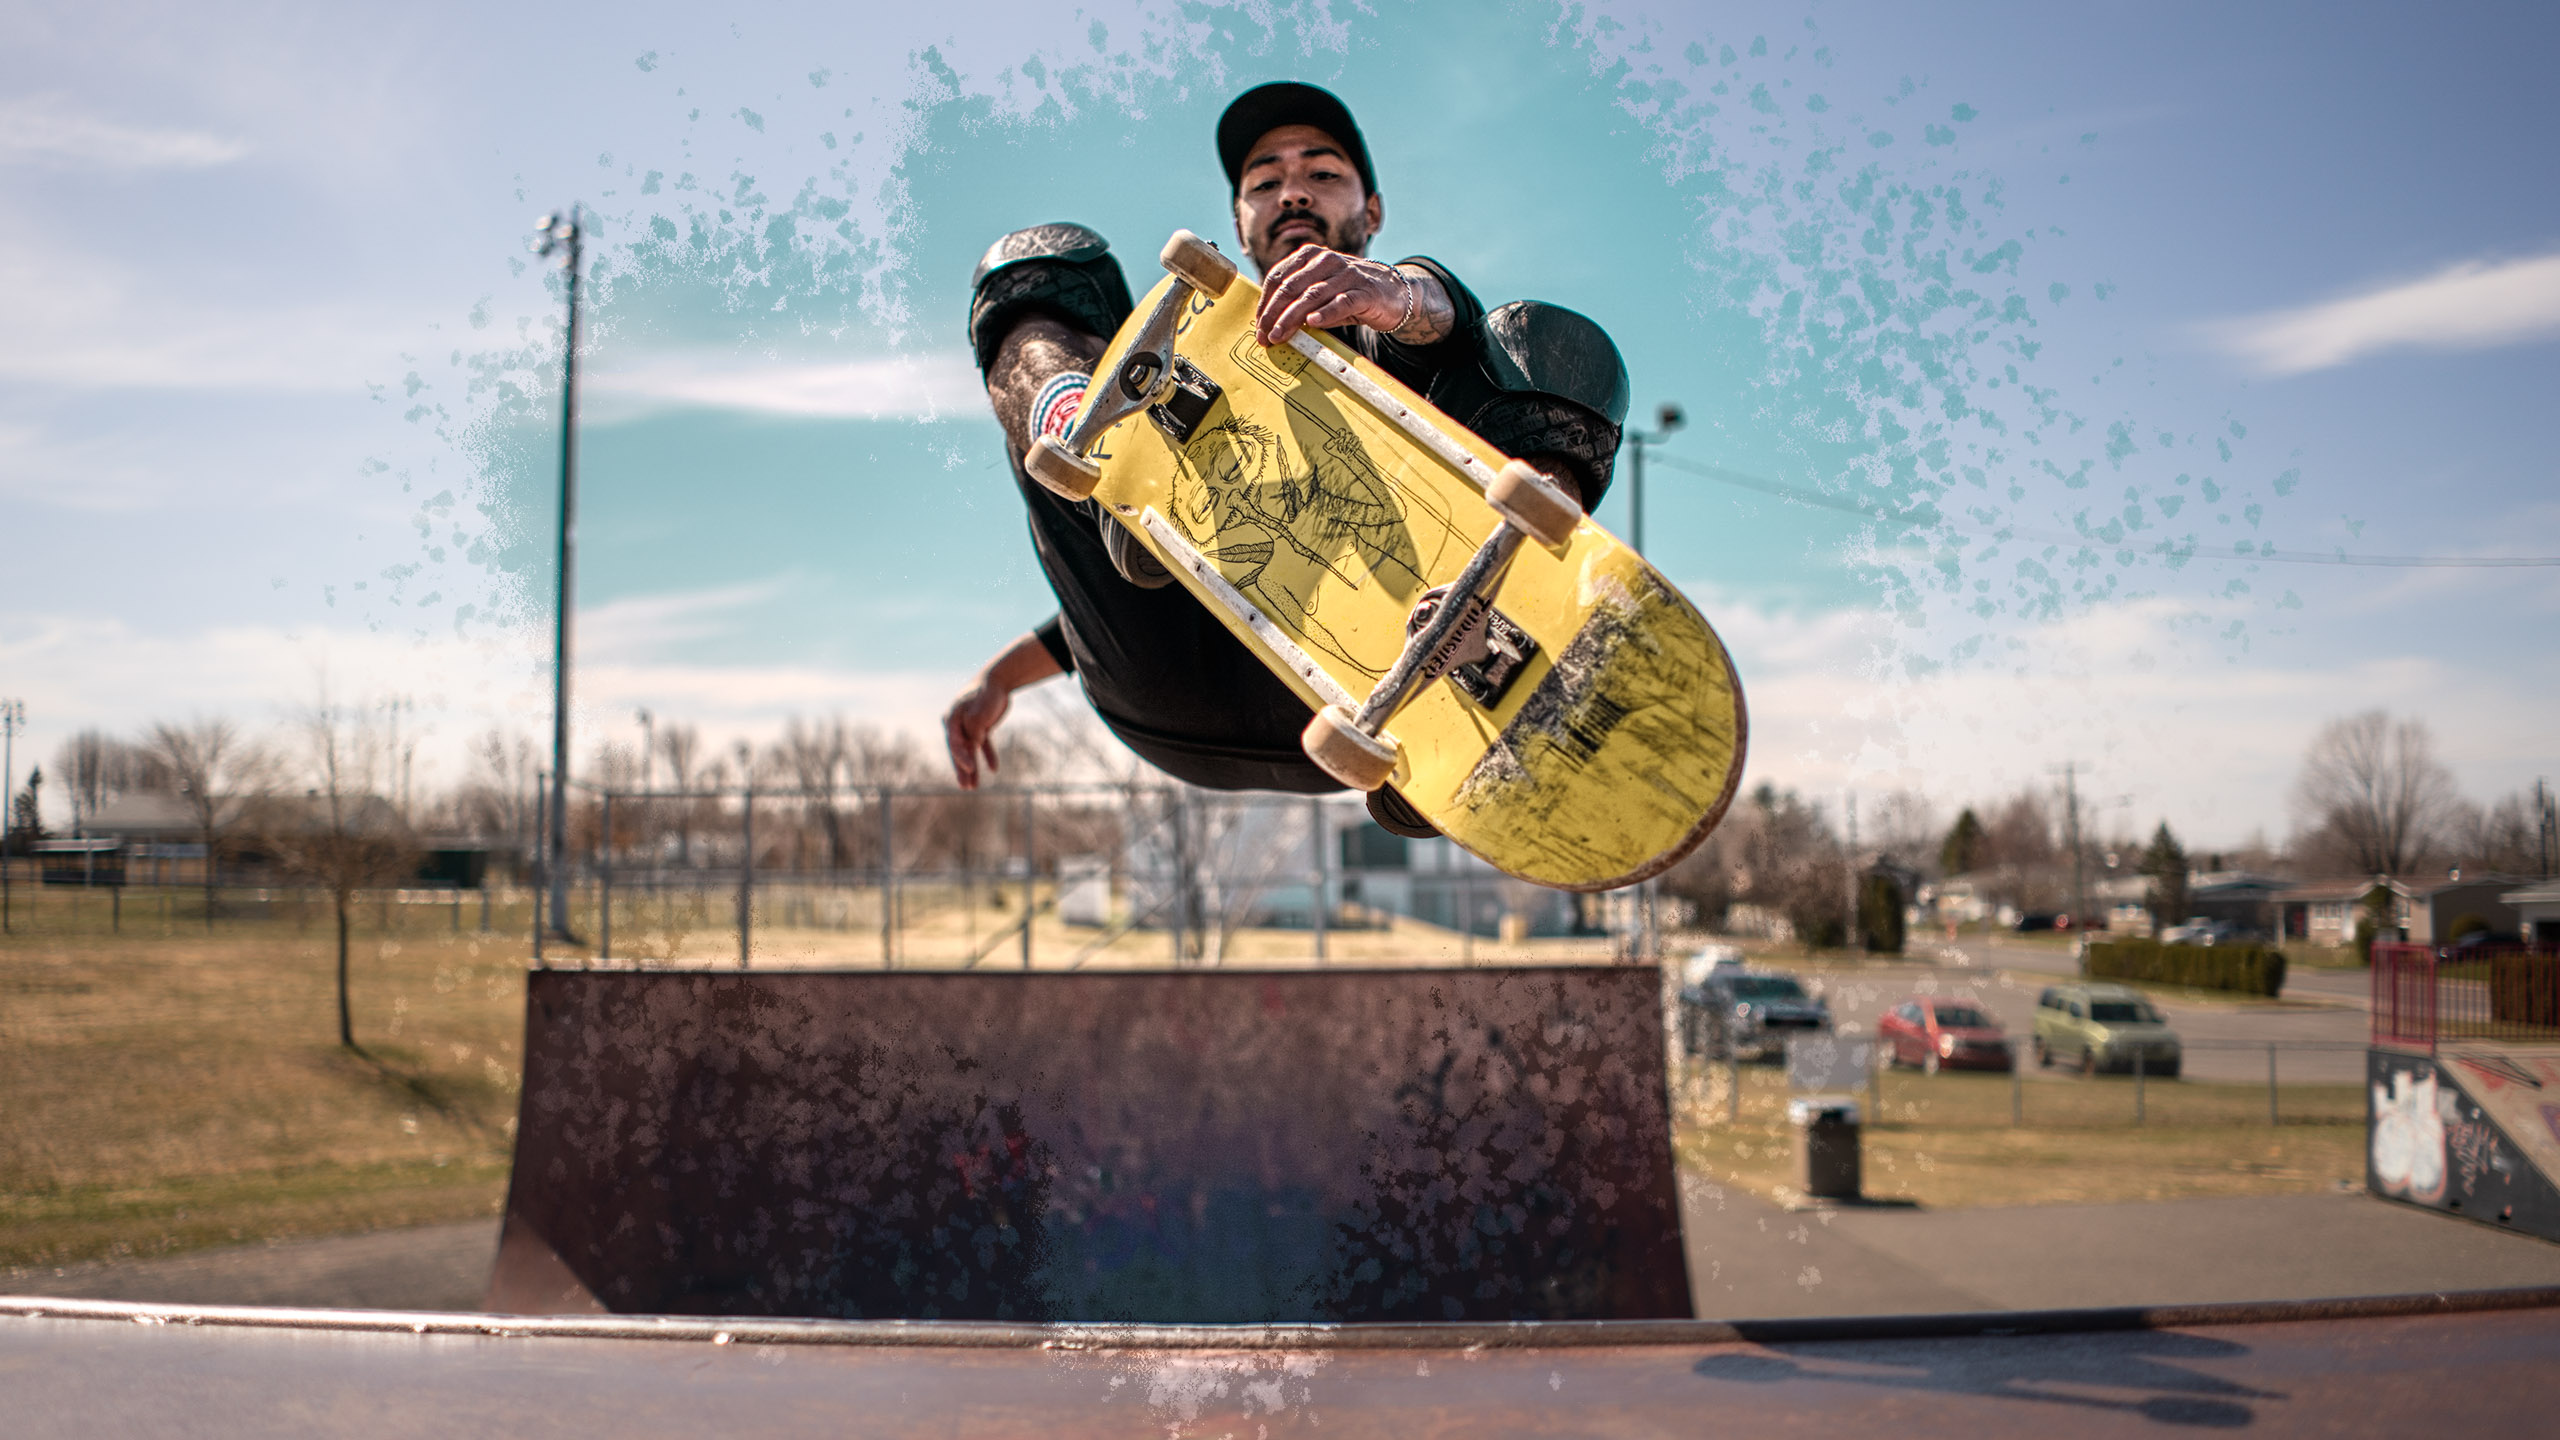 Skater jumping rail HDR